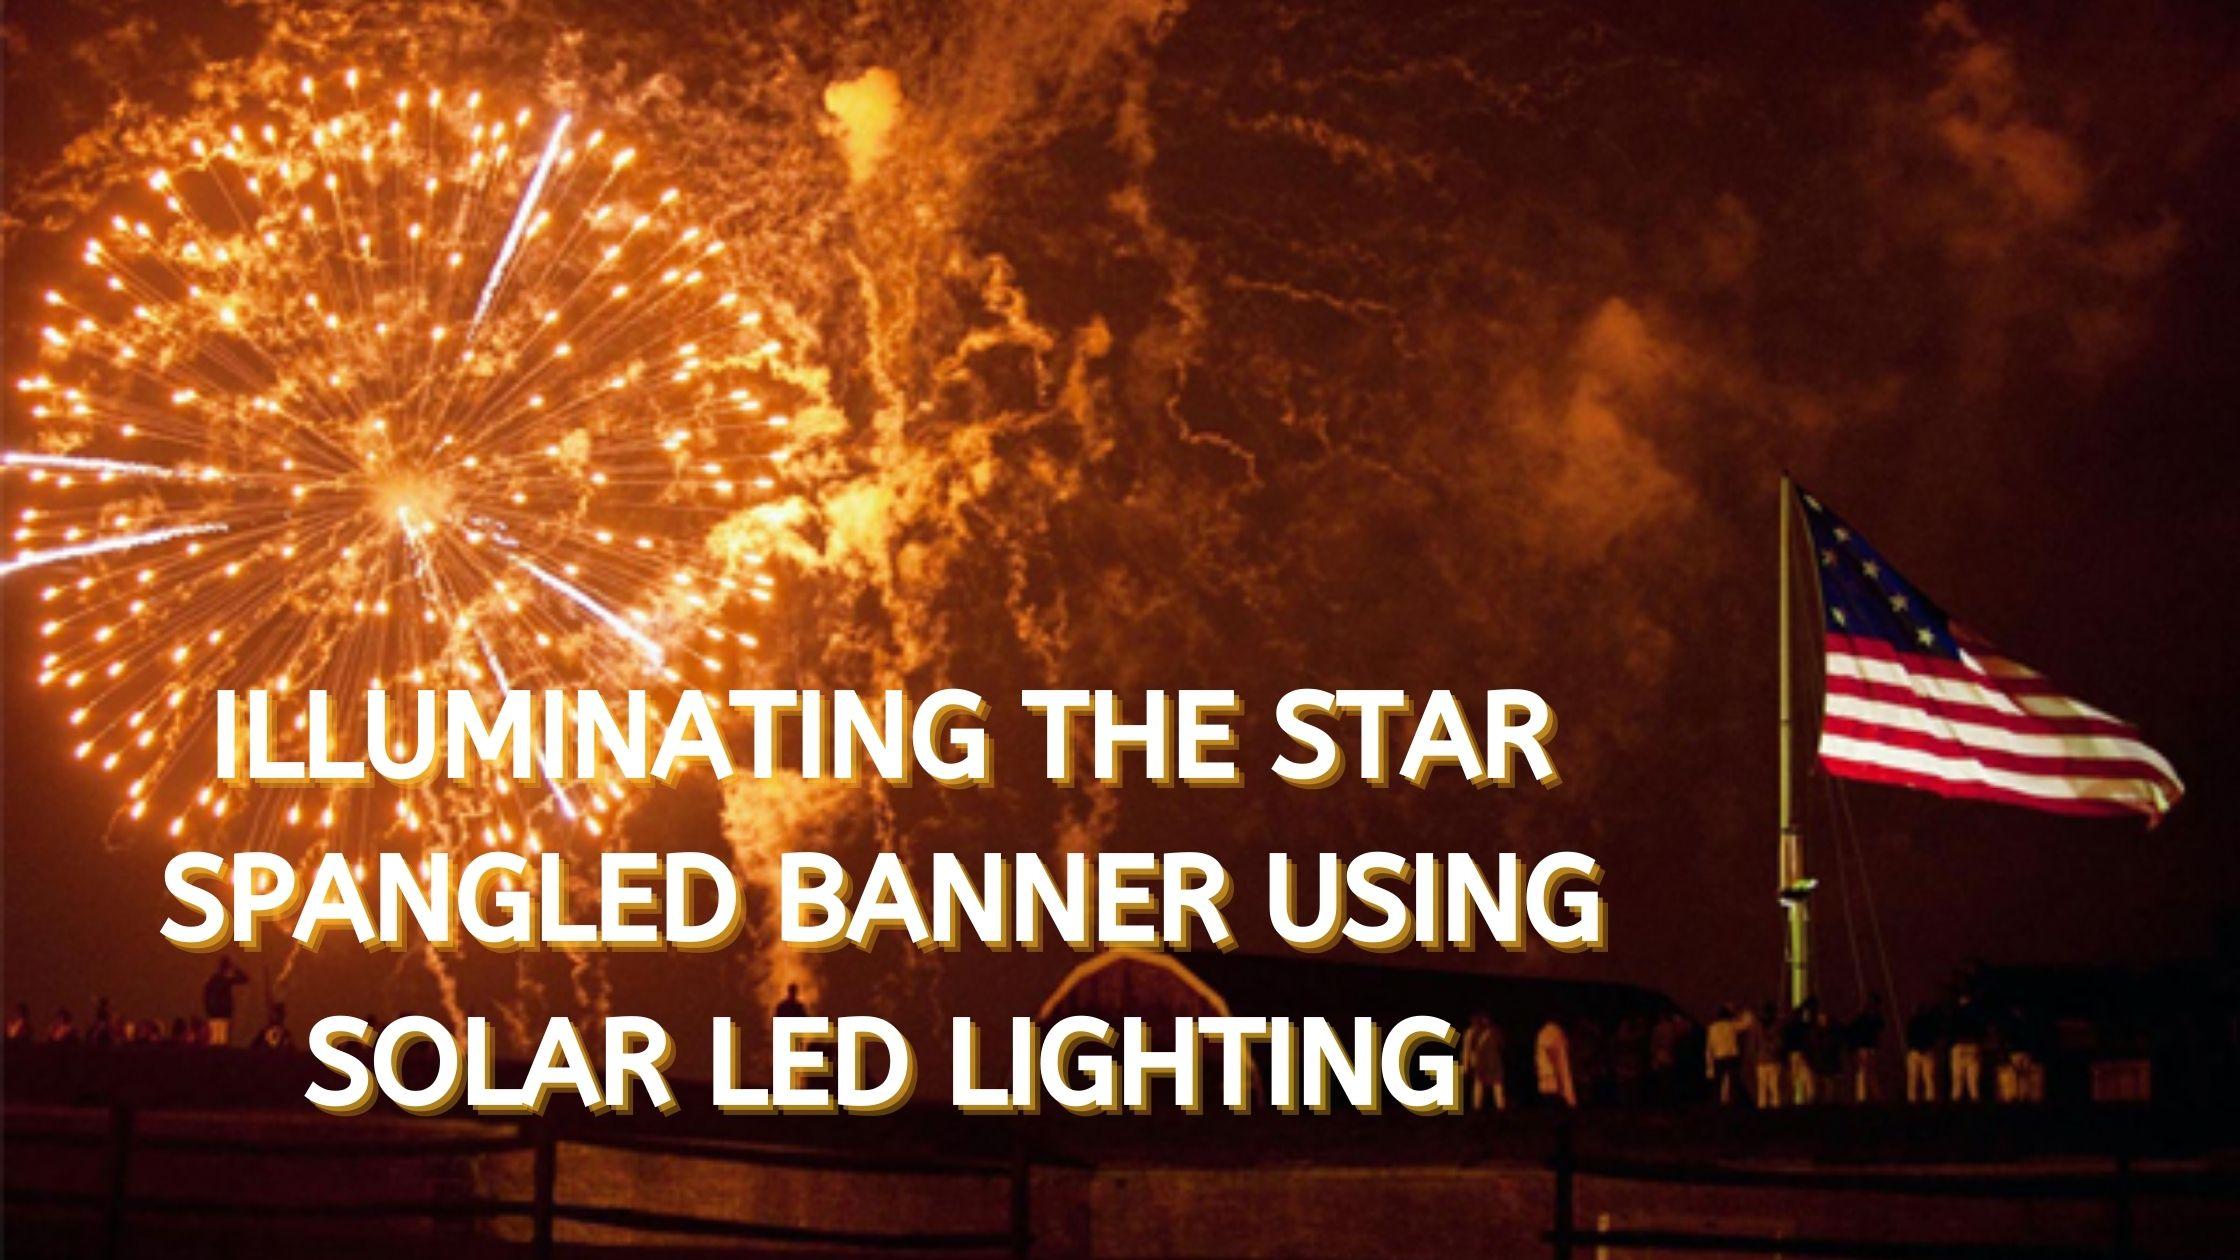 Star Spangled Banner Illuminated by Solar